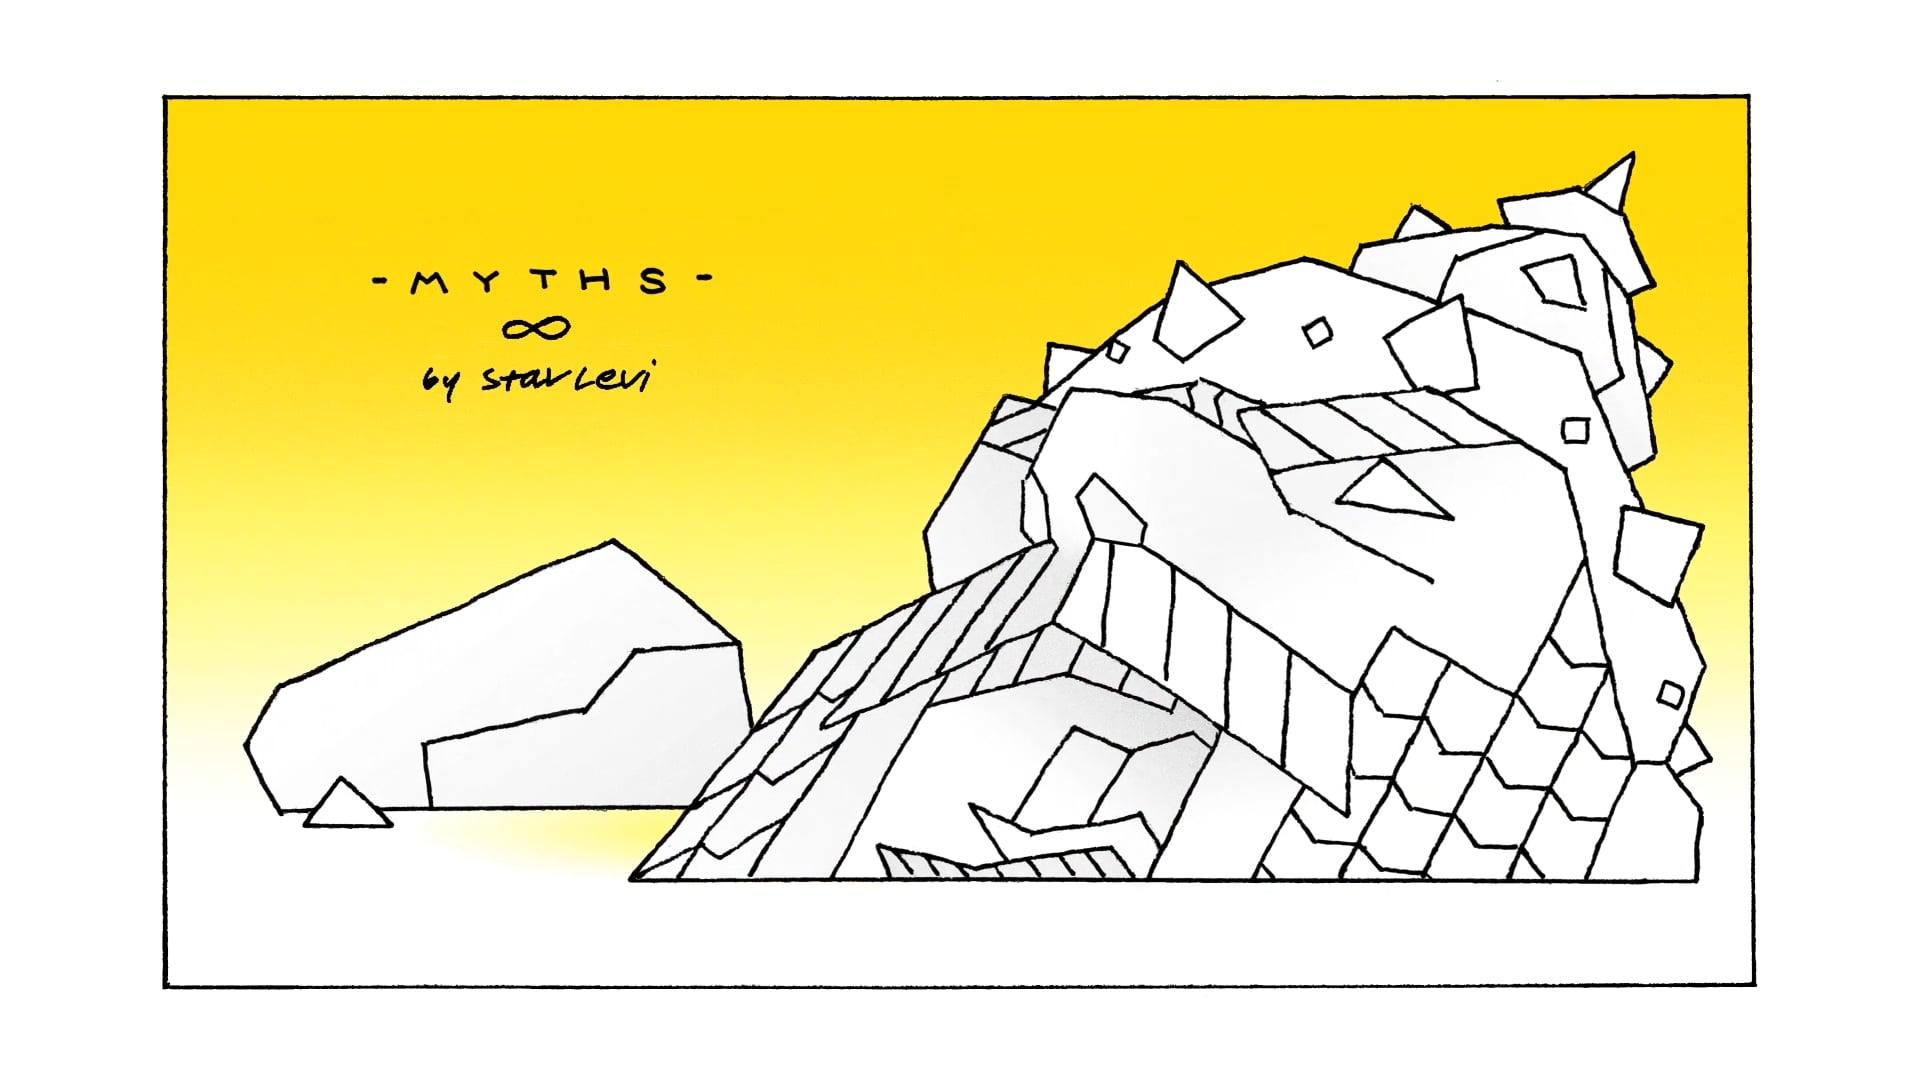 MYTHS (loop)